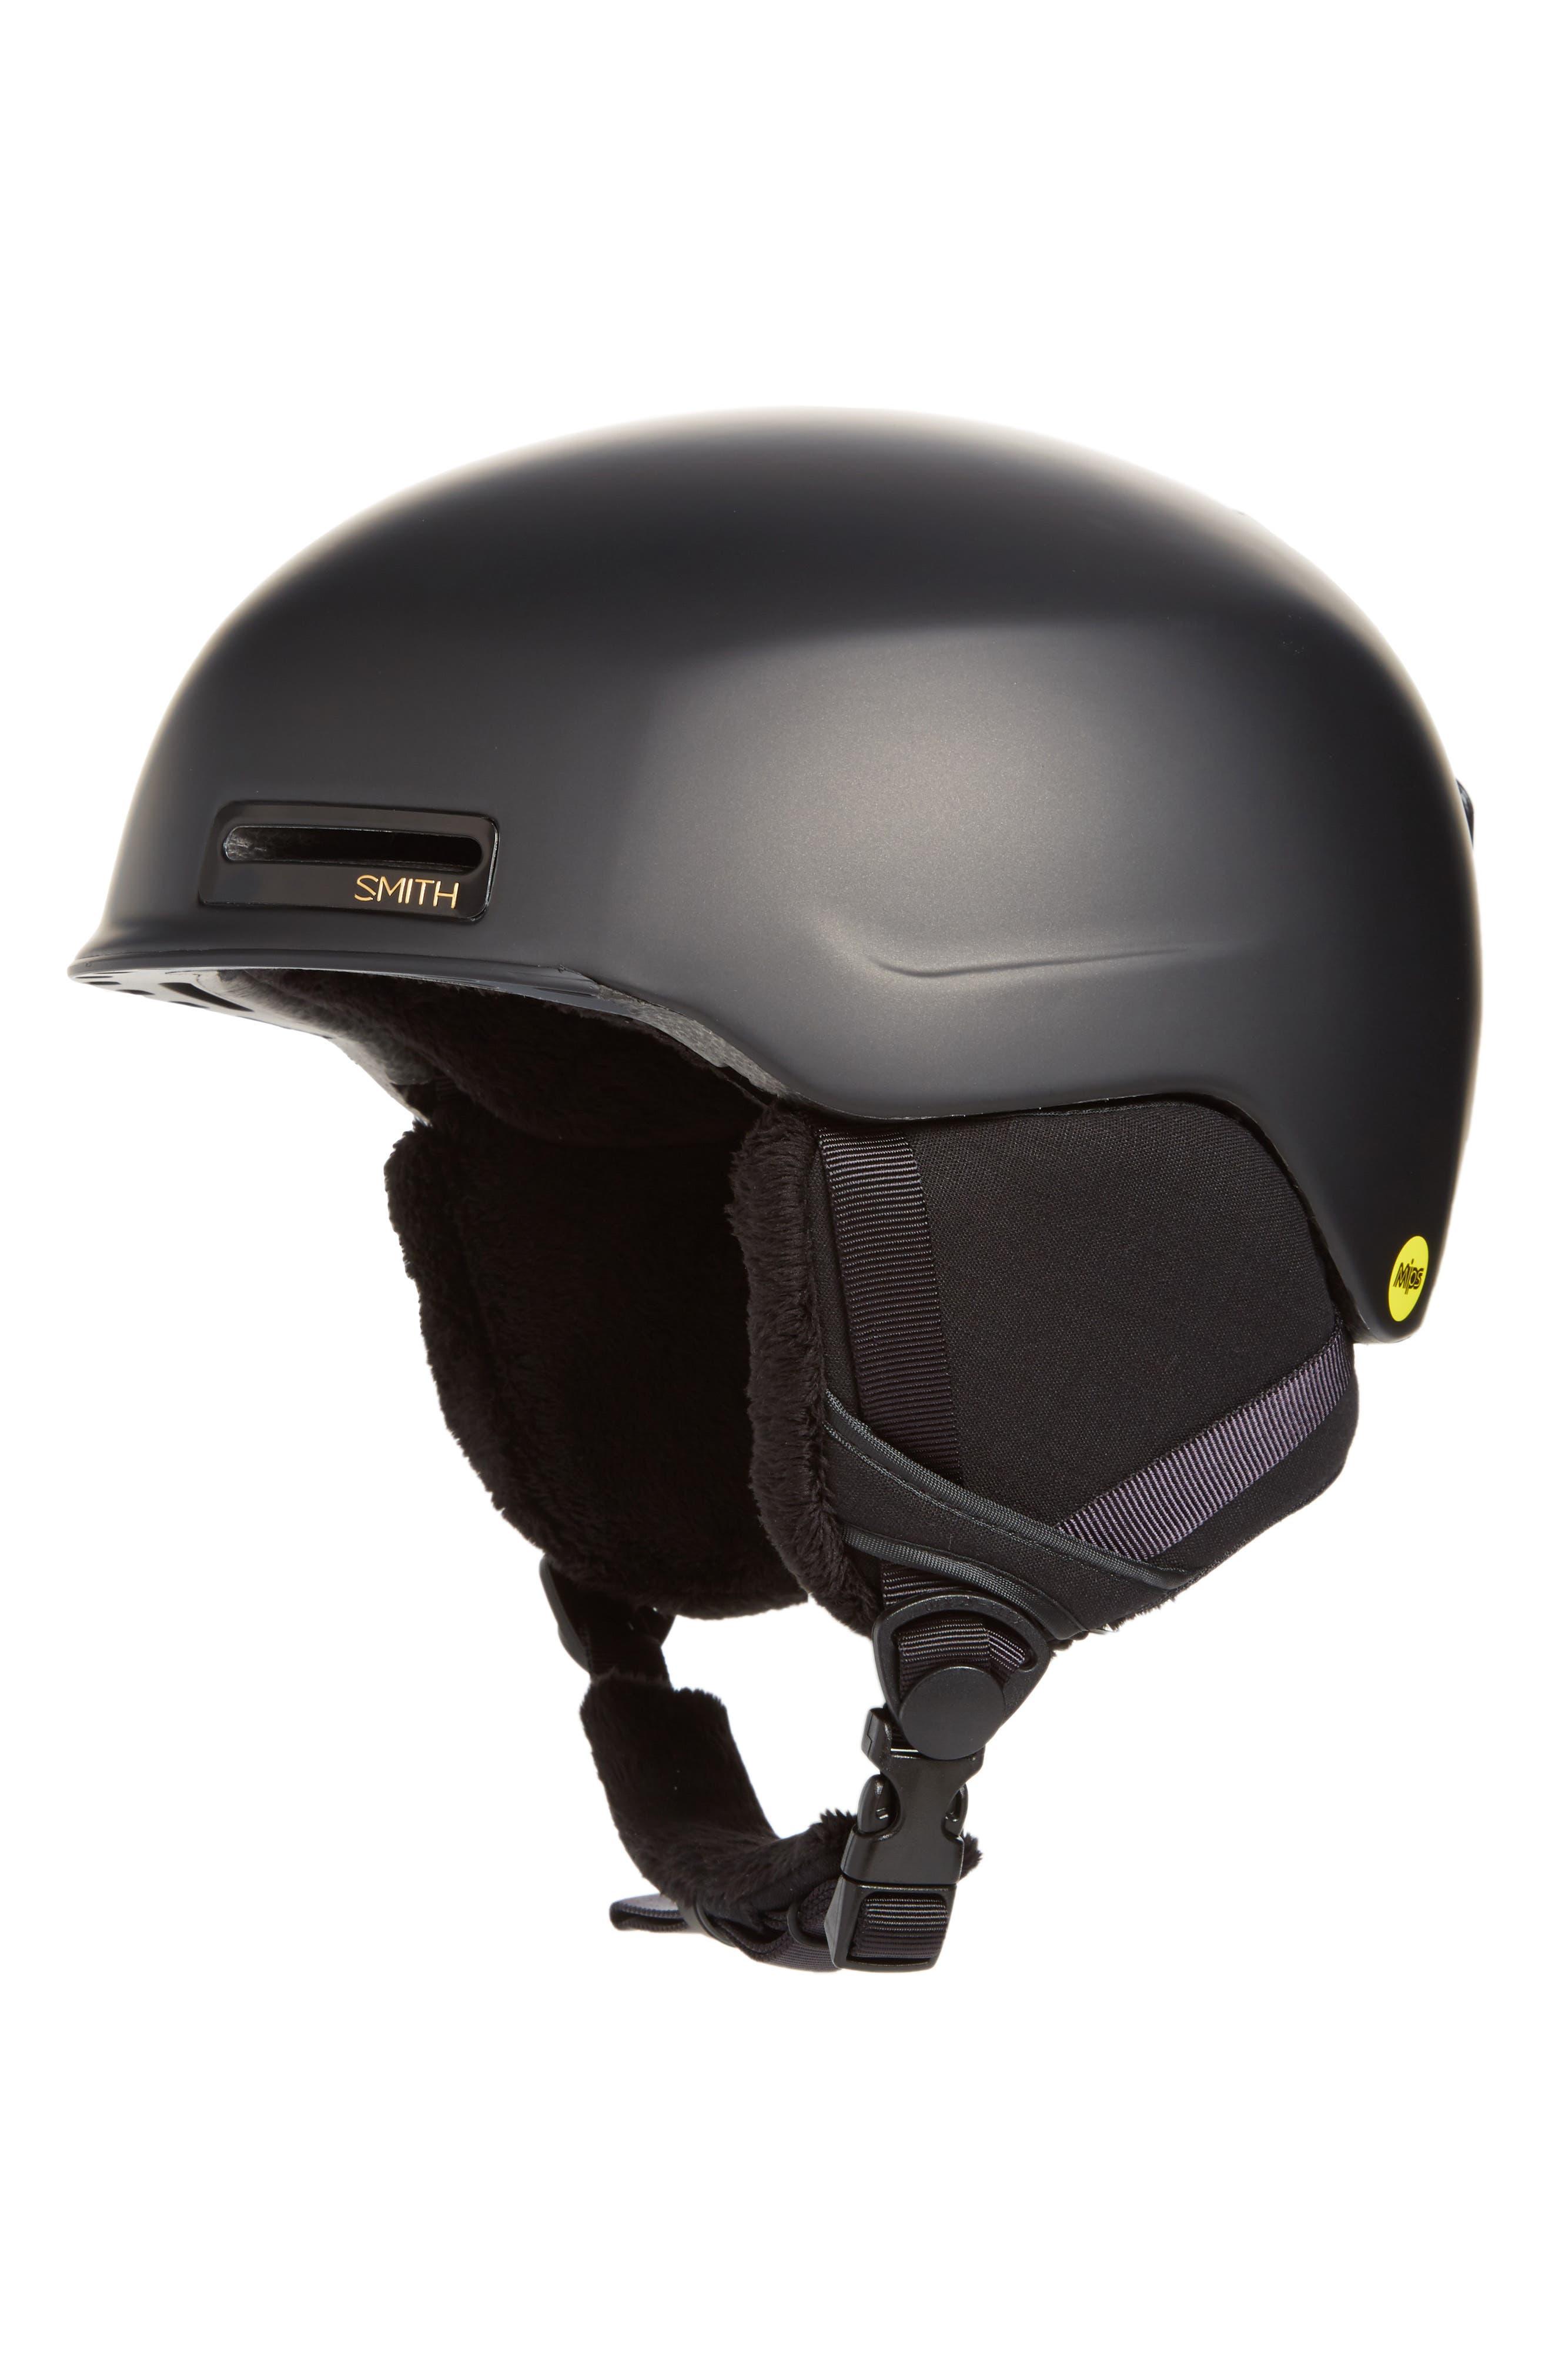 Smith Allure Snow Helmet with MIPS (Women)